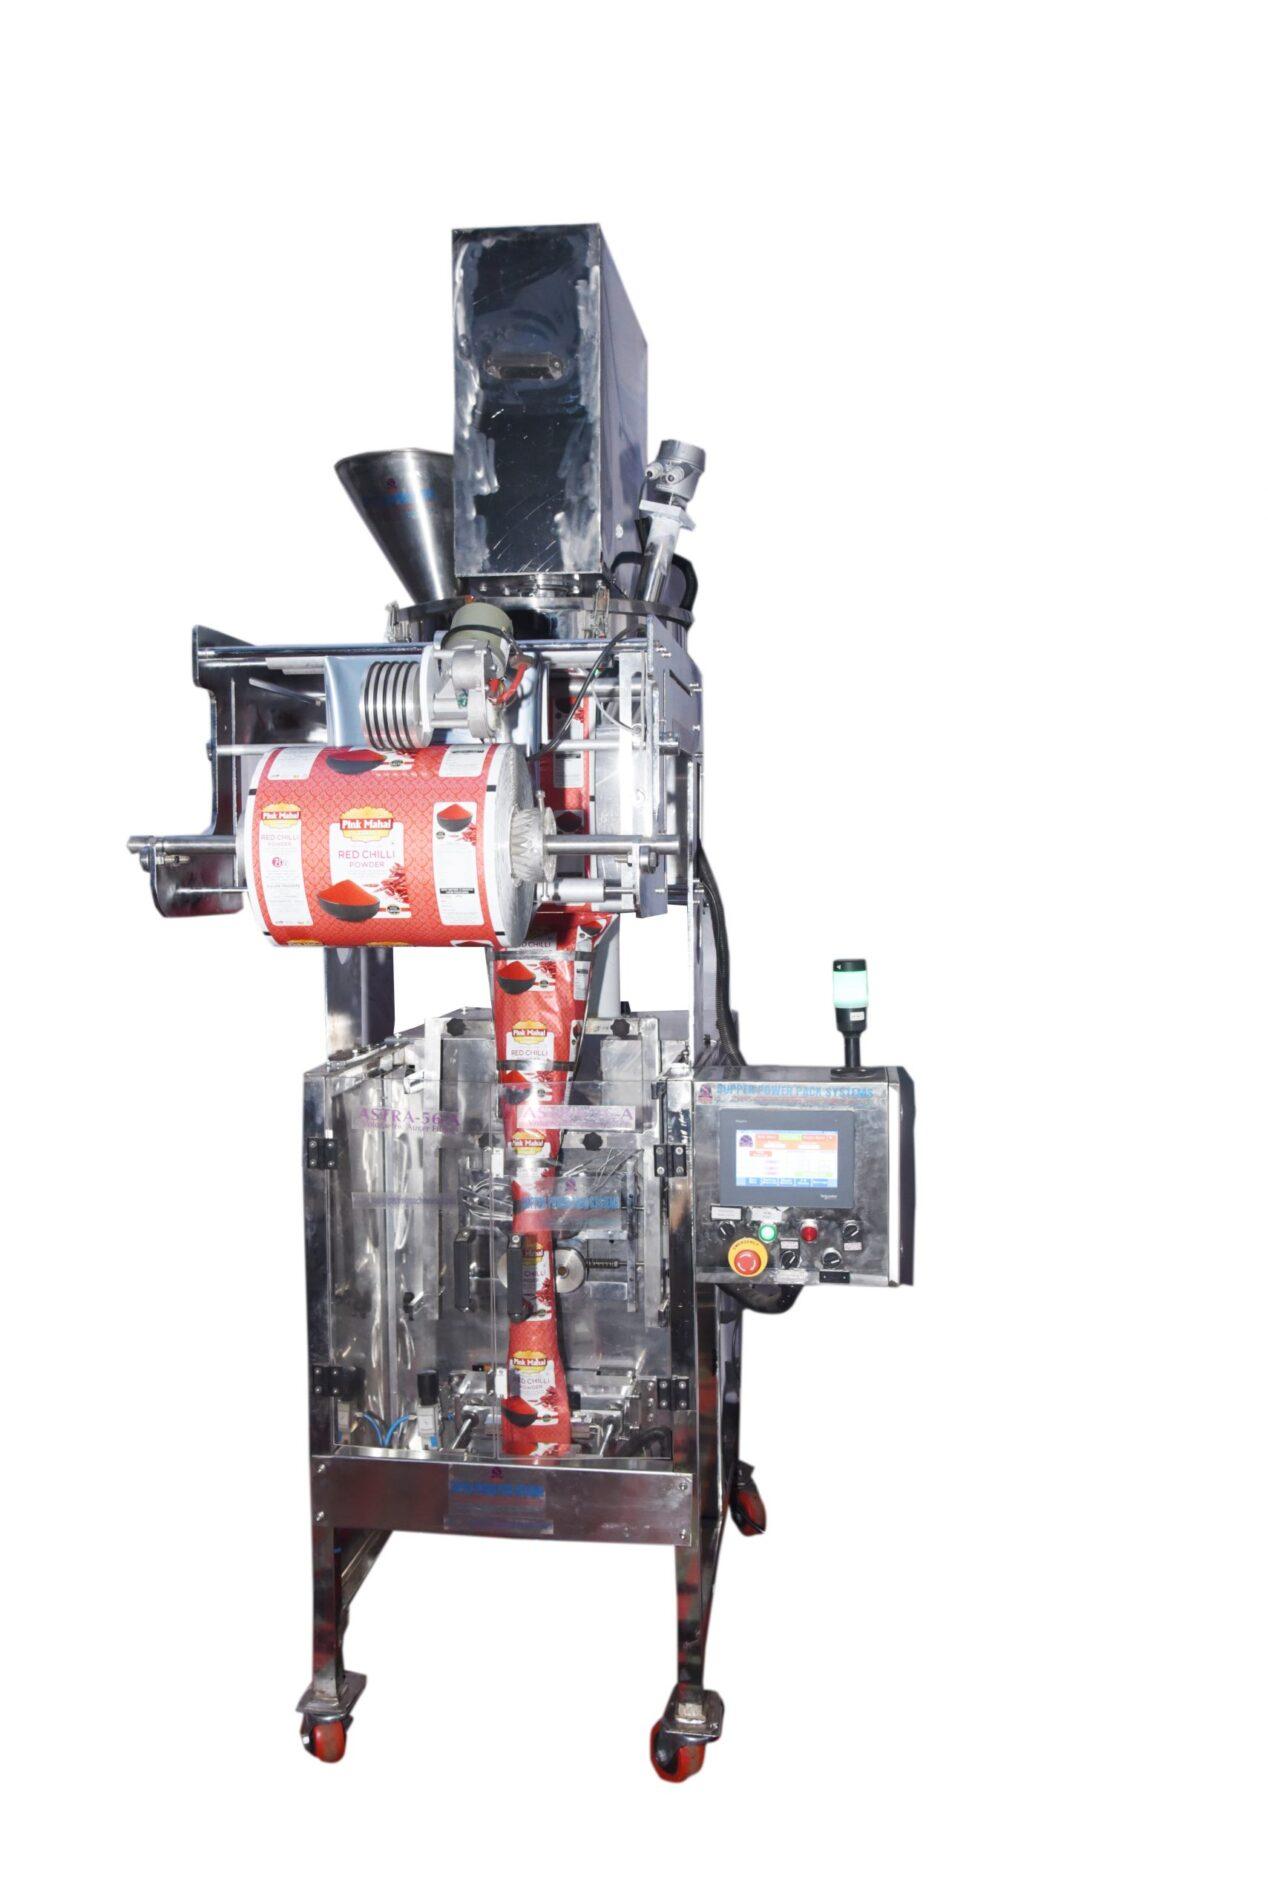 small Masala Packing machine For 10g 15g 20g 25g 50g 100g 200g 250gms